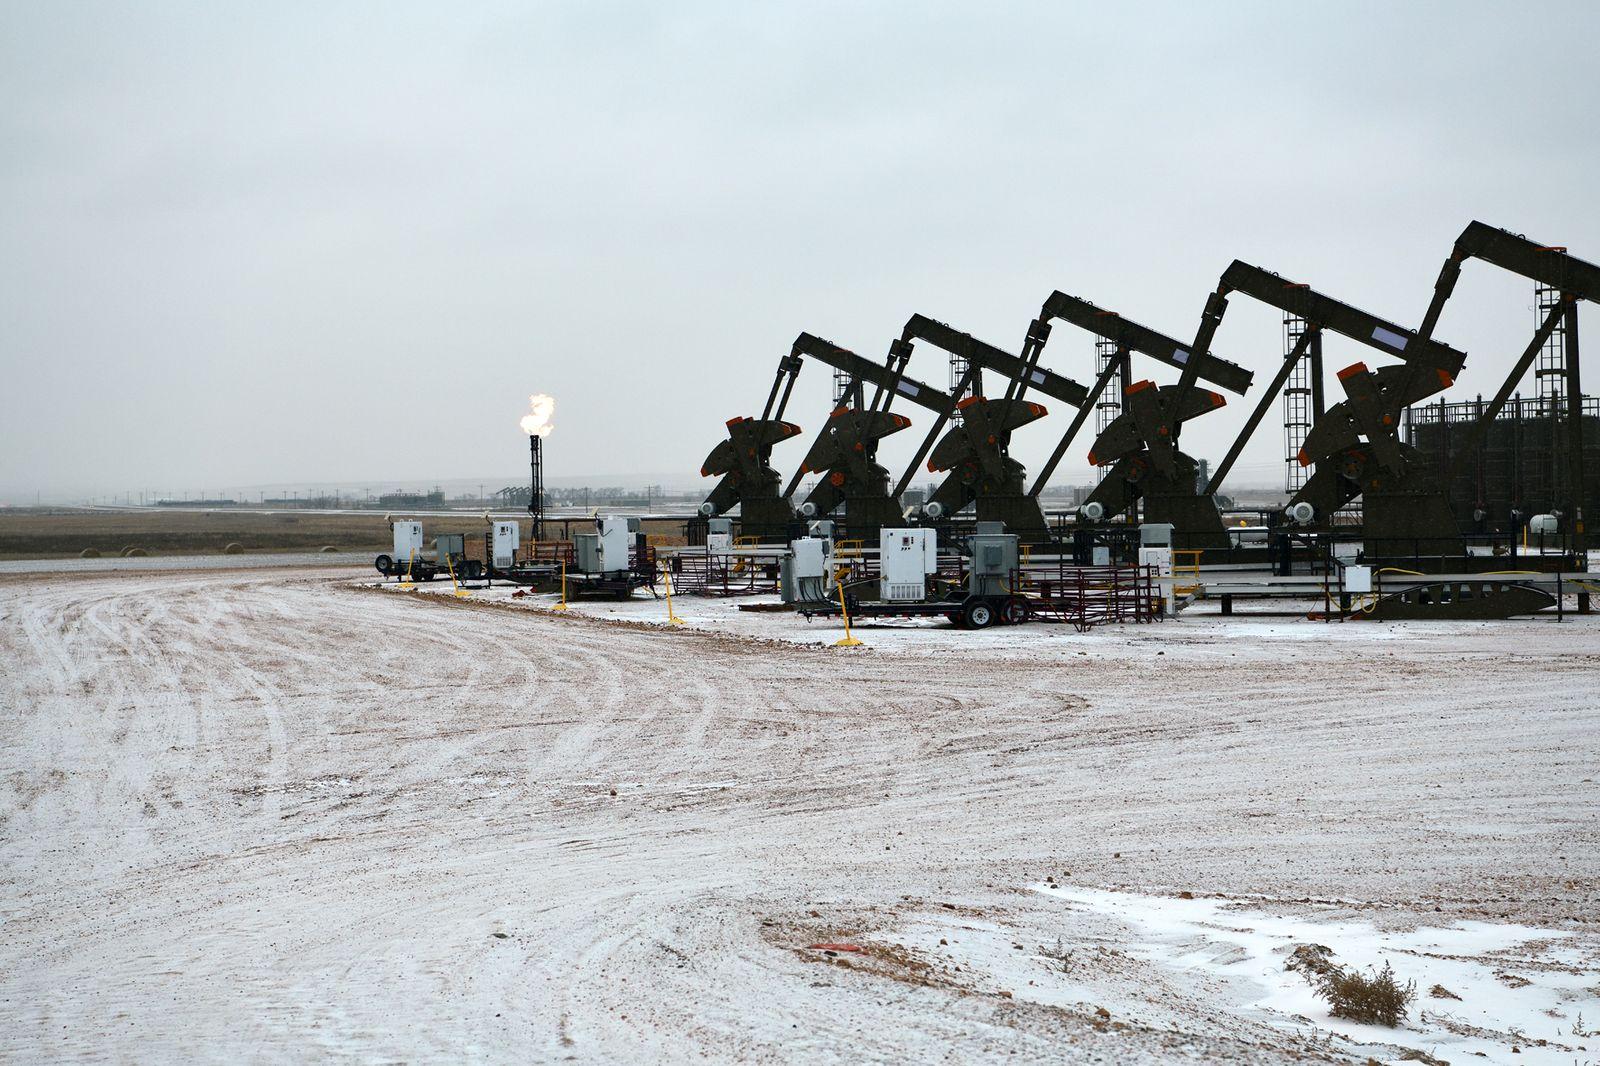 Pumpjack at Williston, North Dakota, USA